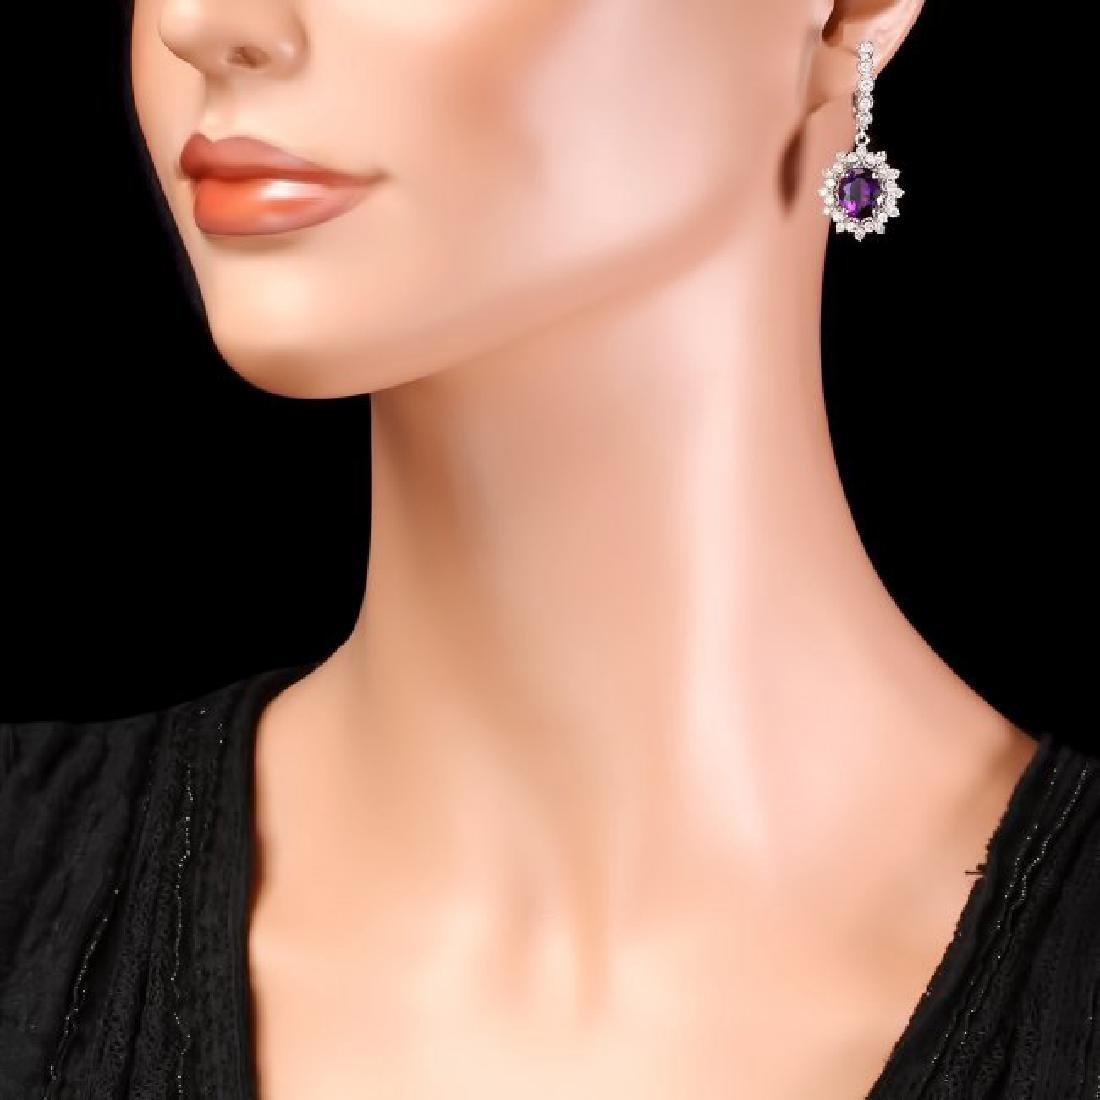 14k Gold 5ct Amethyst 1.95ct Diamond Earrings - 4